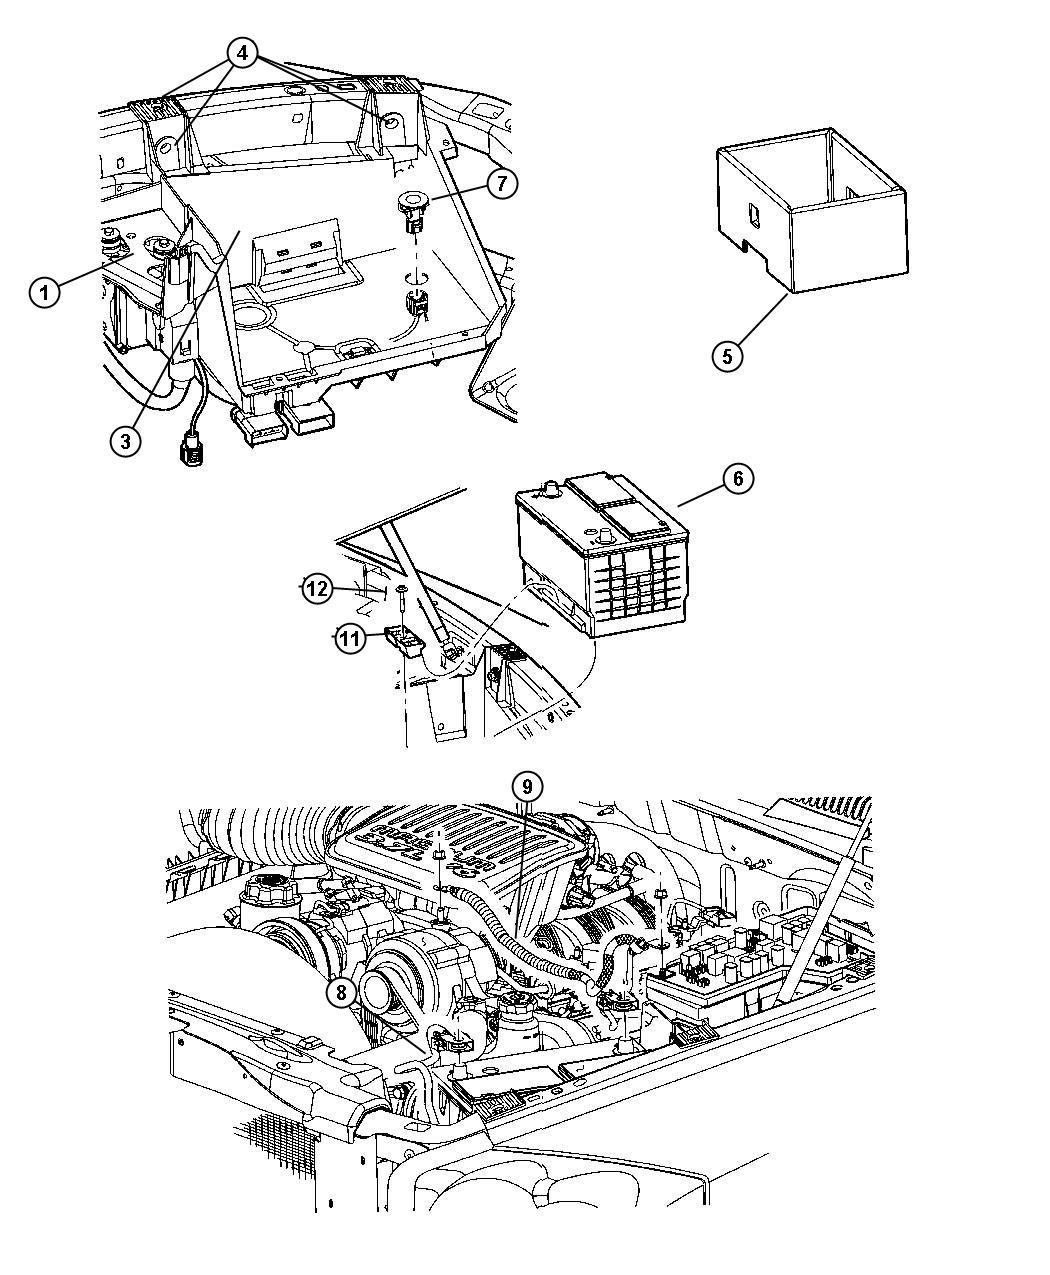 2005 Dodge Dakota Battery Tray & Cables